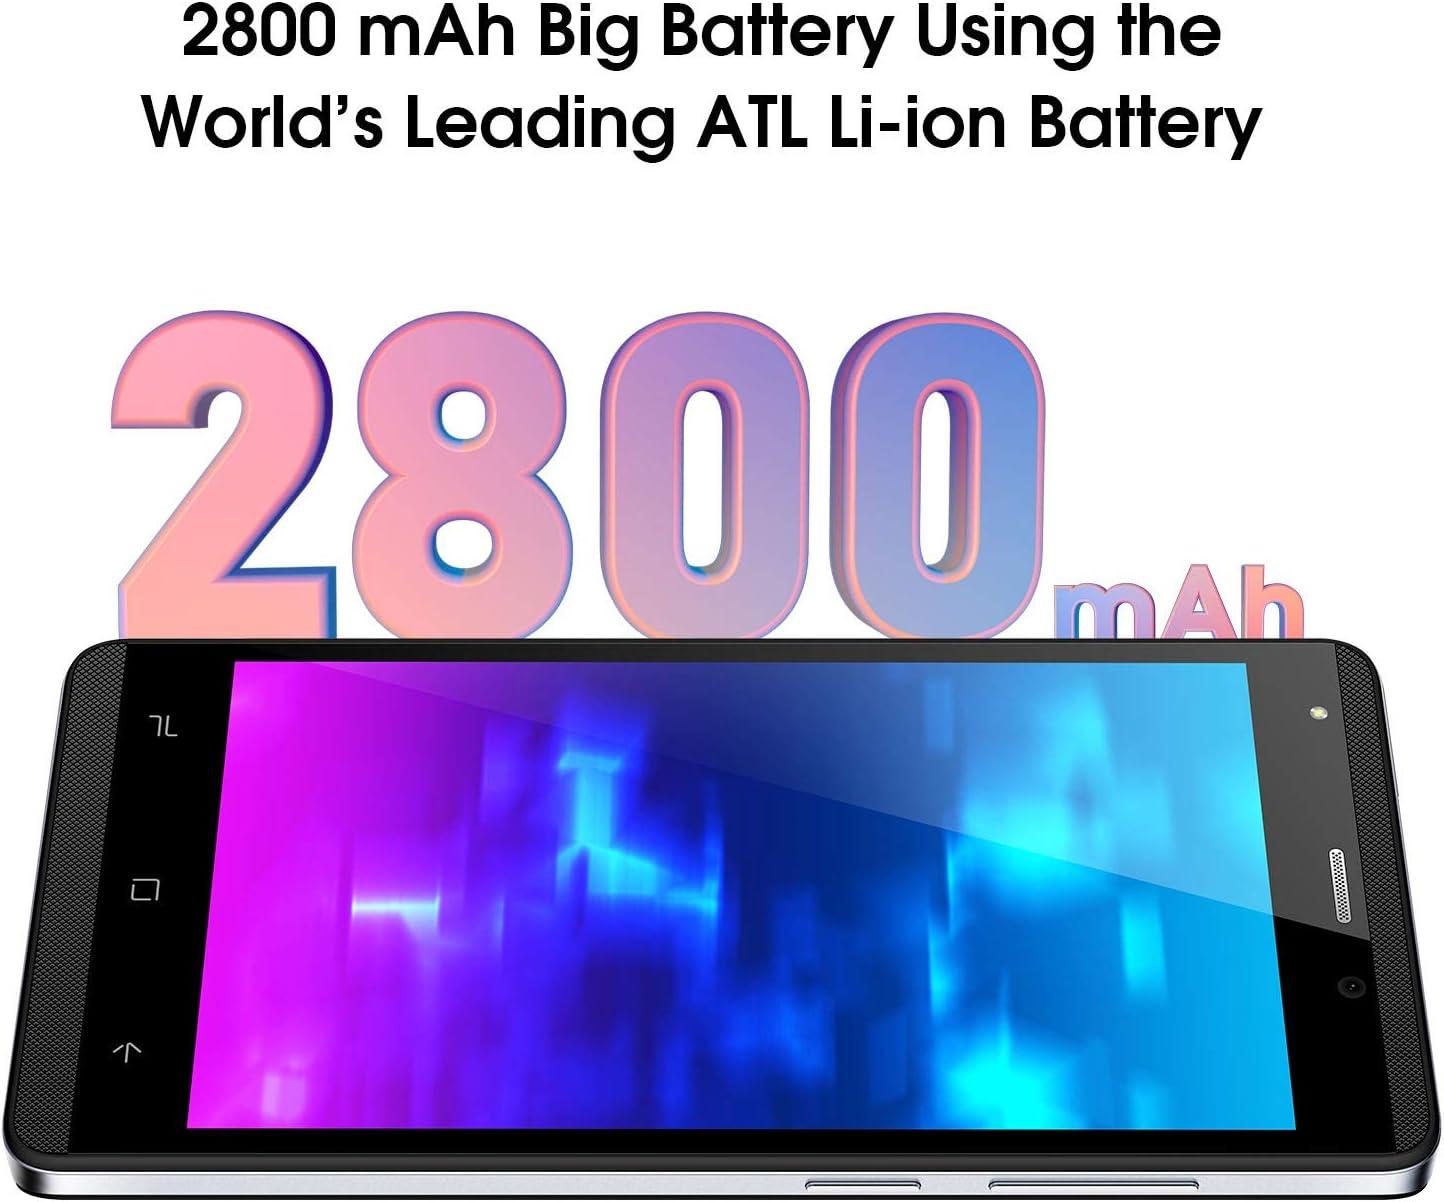 Moviles Baratos y buenos 4G, J3 16GB ROM 5.0